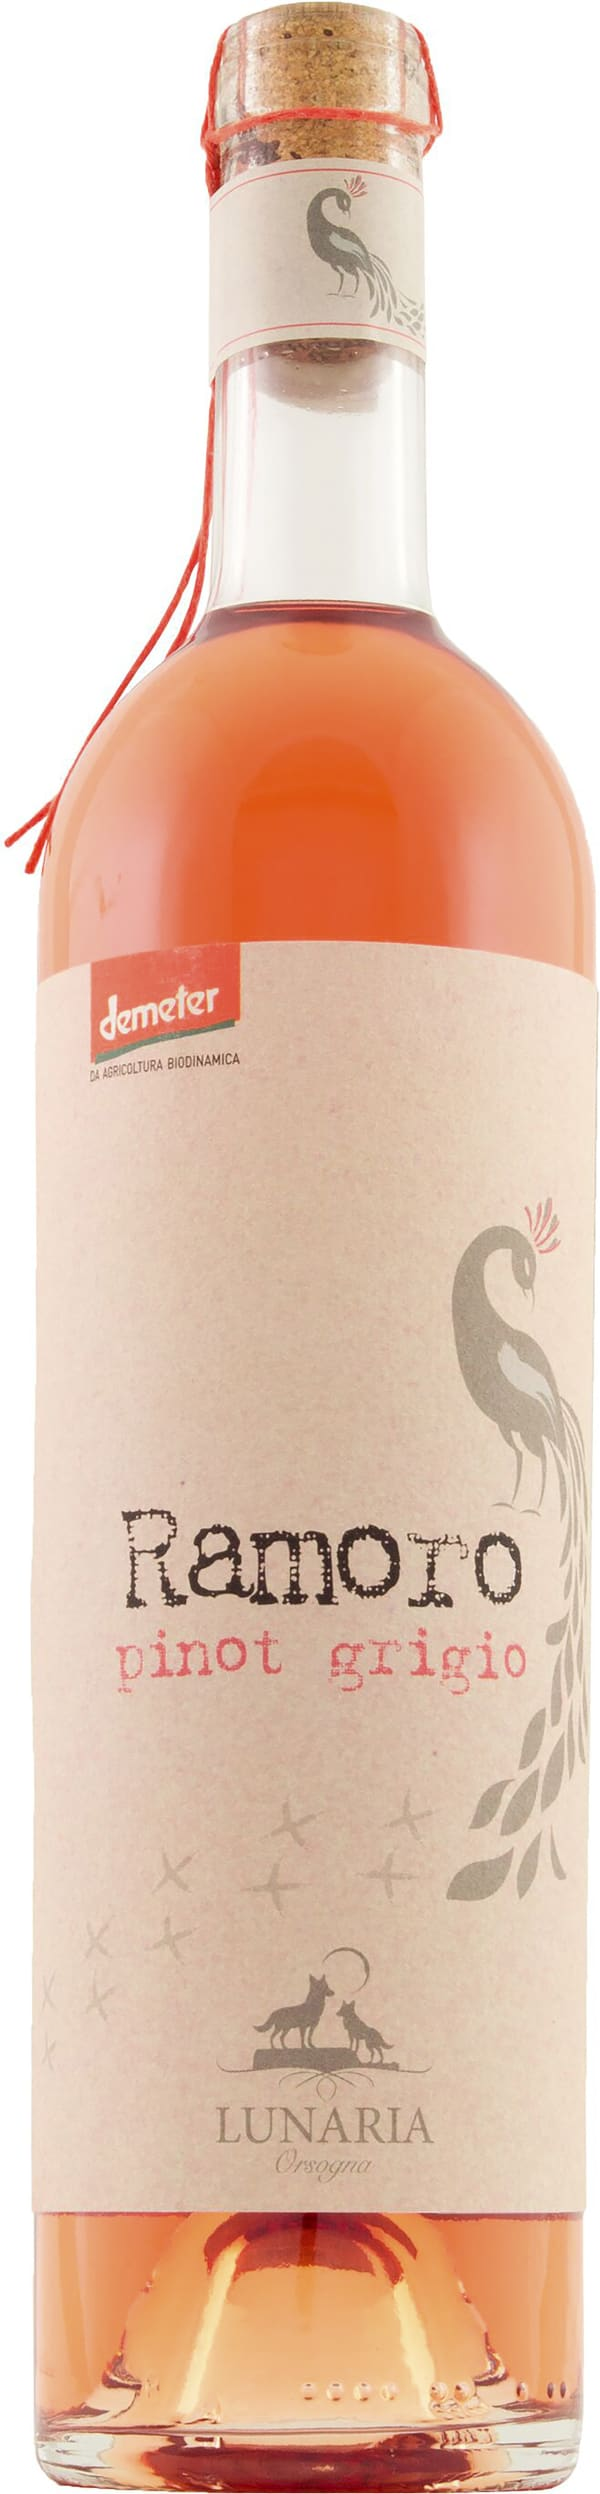 Orsogna Lunaria Ramoro Pinot Grigio Rosé 2018